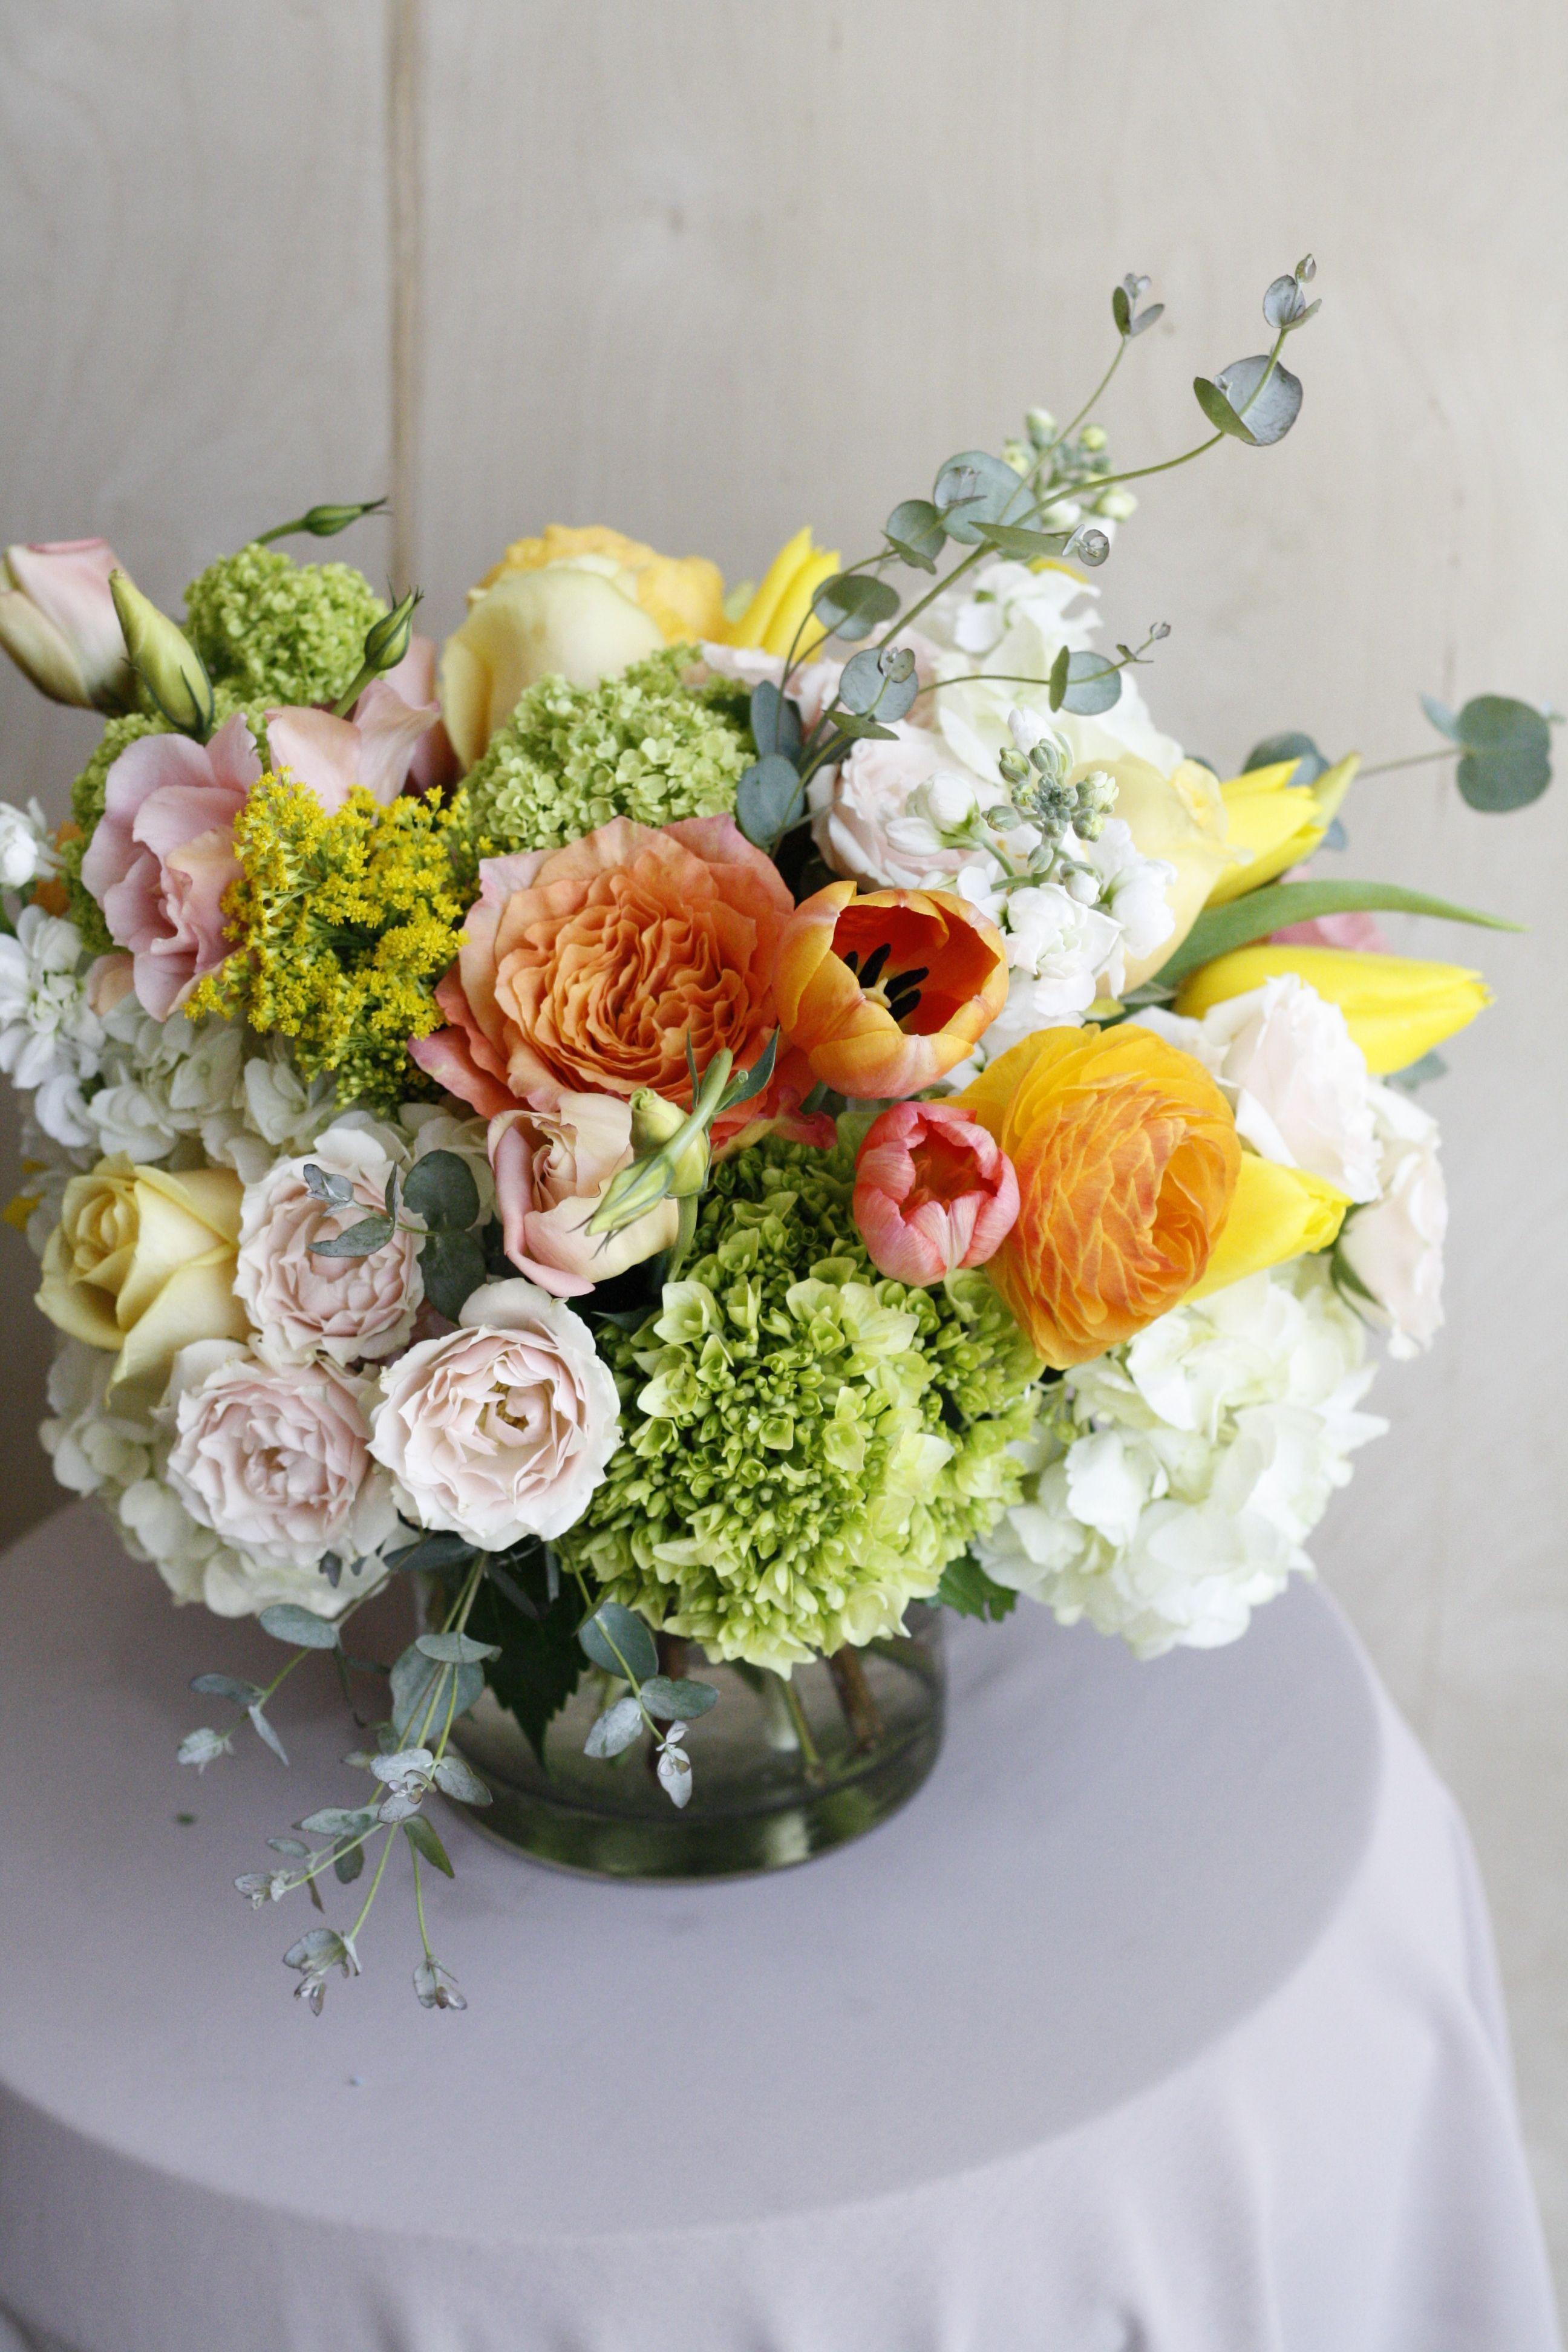 Stunning Florals Delivery From Our Santa Monica Florist Floral Wedding Flowers Flower Arrangements